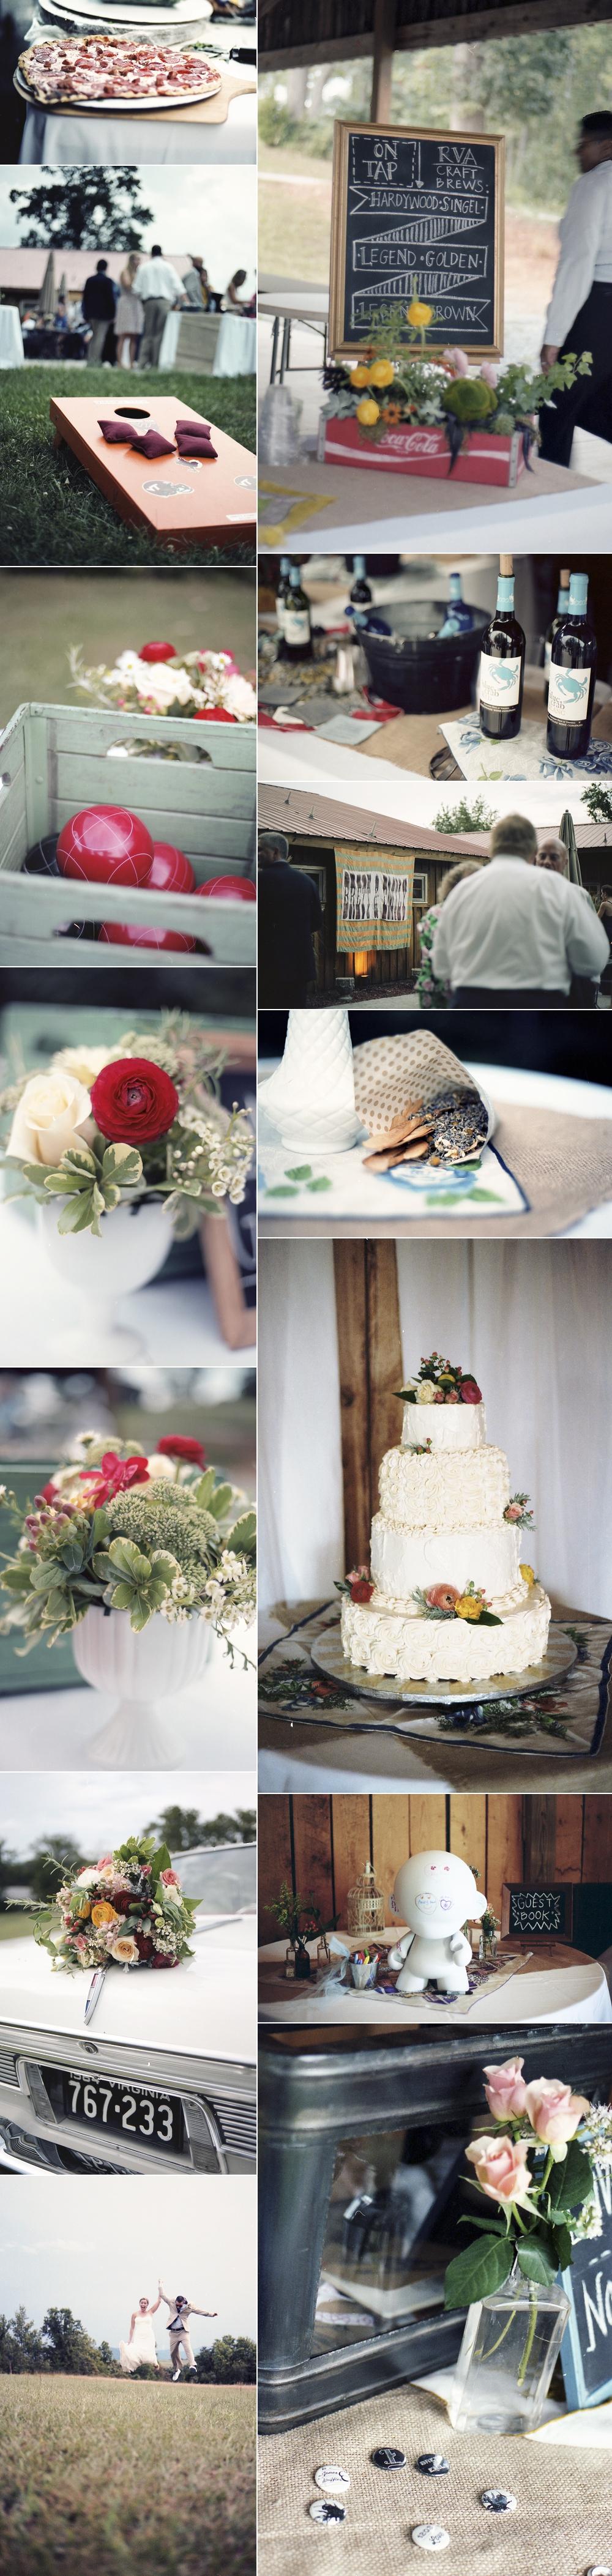 boxtree-lodge-vinton-wedding-photos_0014.jpg